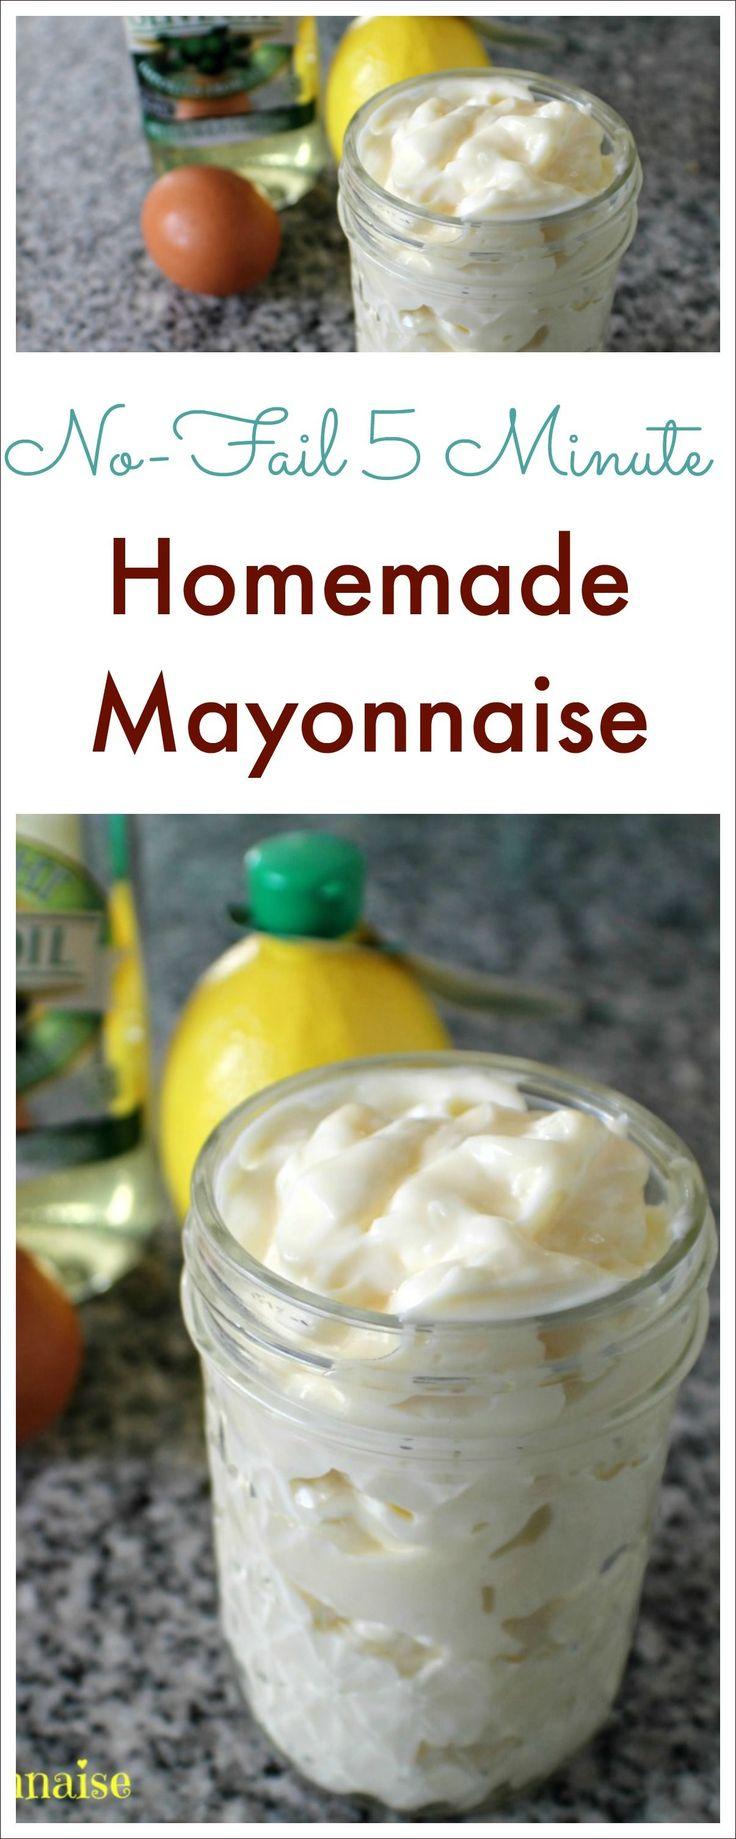 The 25 Best Mayonnaise Ideas On Pinterest Mayonnaise